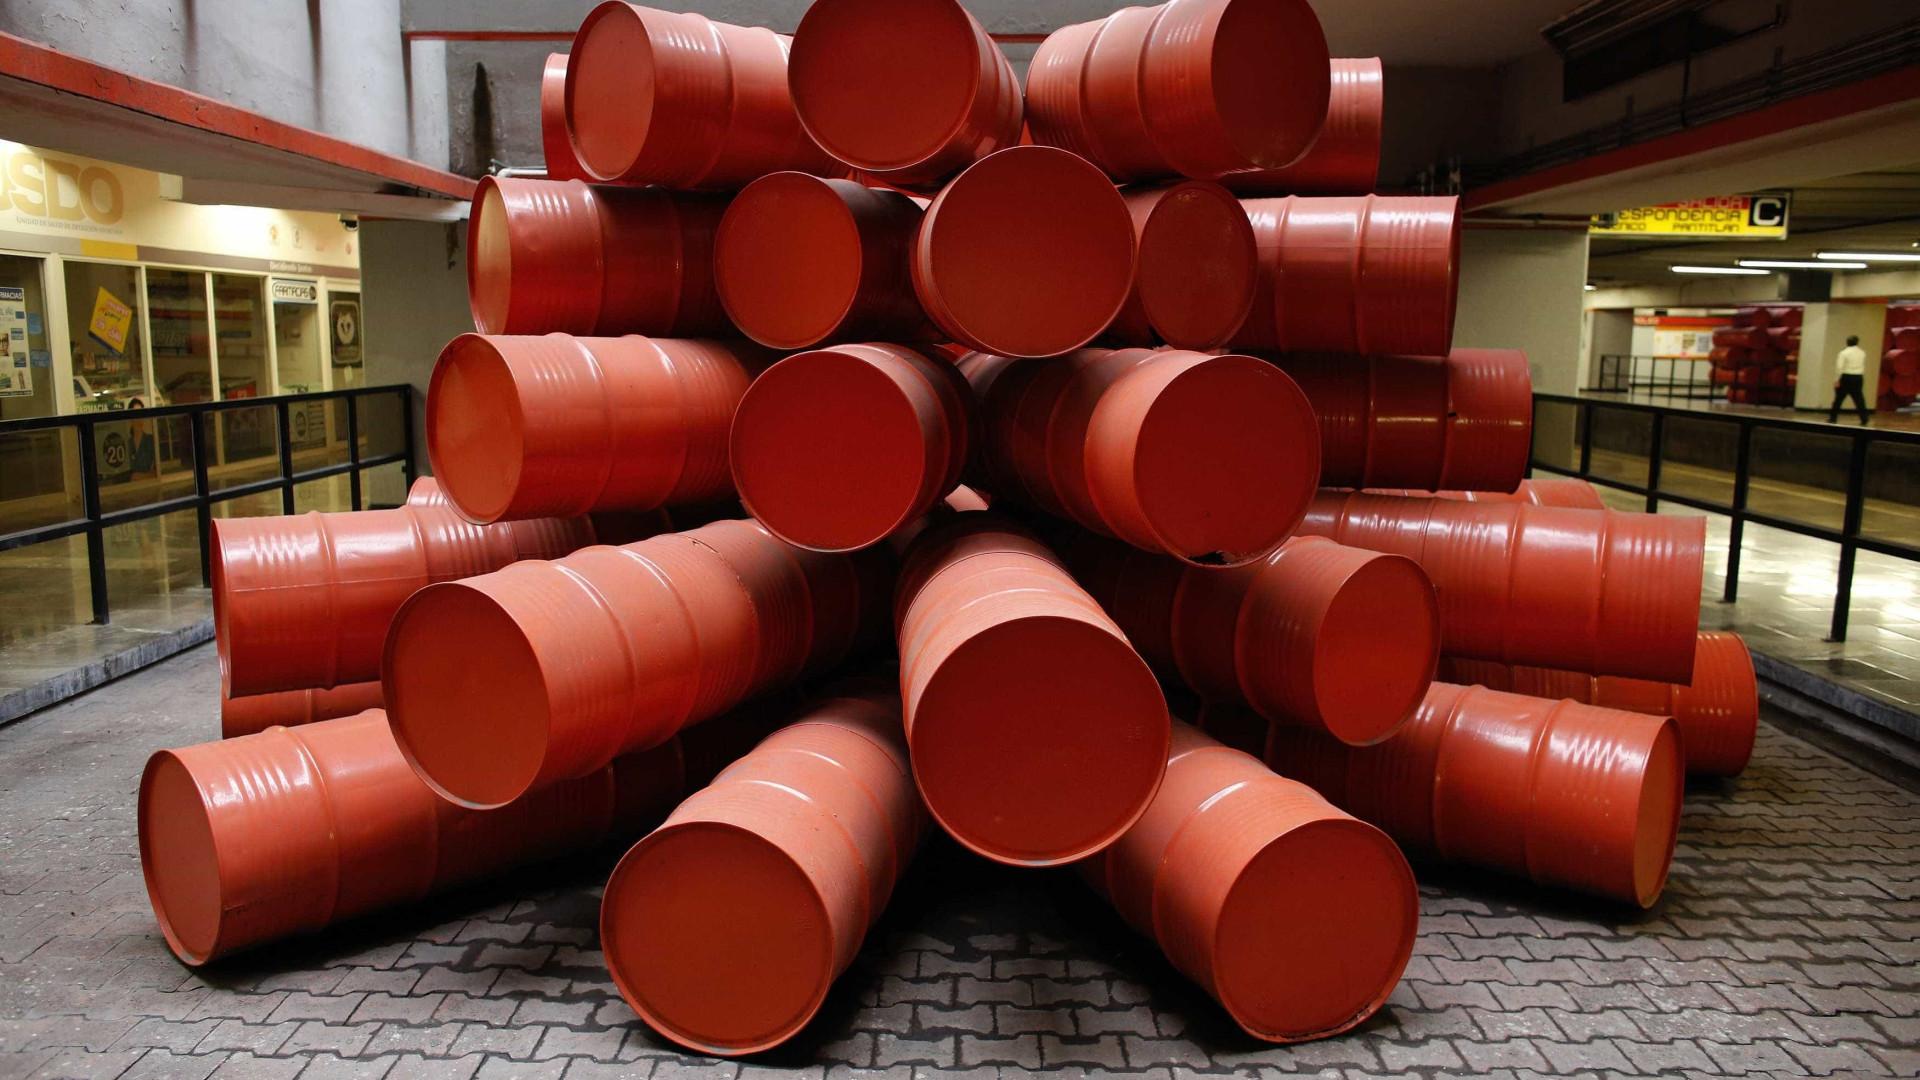 Petróleo Brent abre em baixa no mercado de futuros